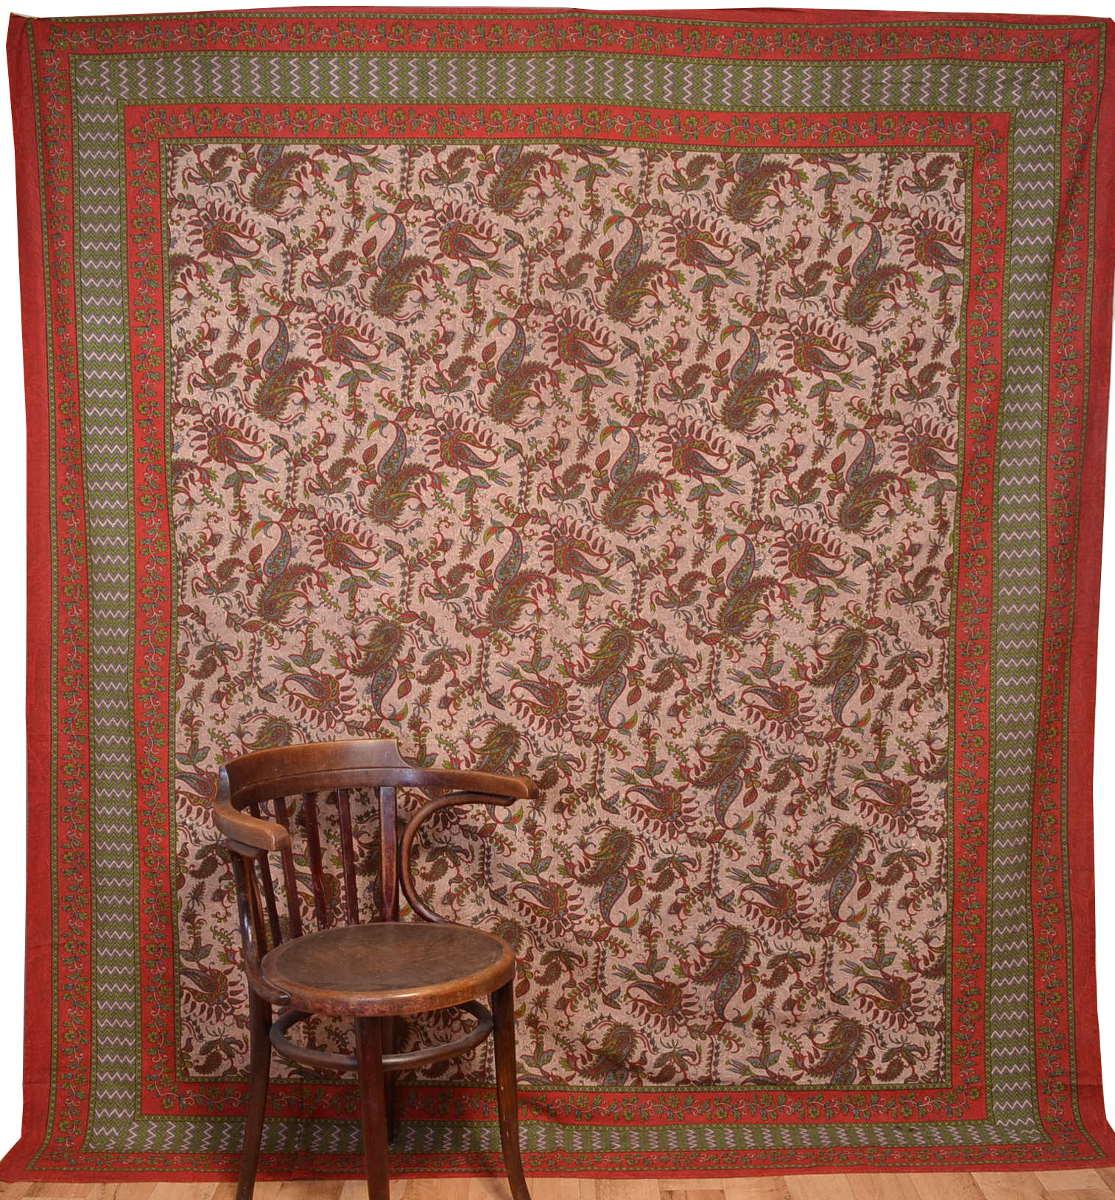 Indische paisley tagesdecke berwurf wandbehang talisman for Tagesdecke paisley